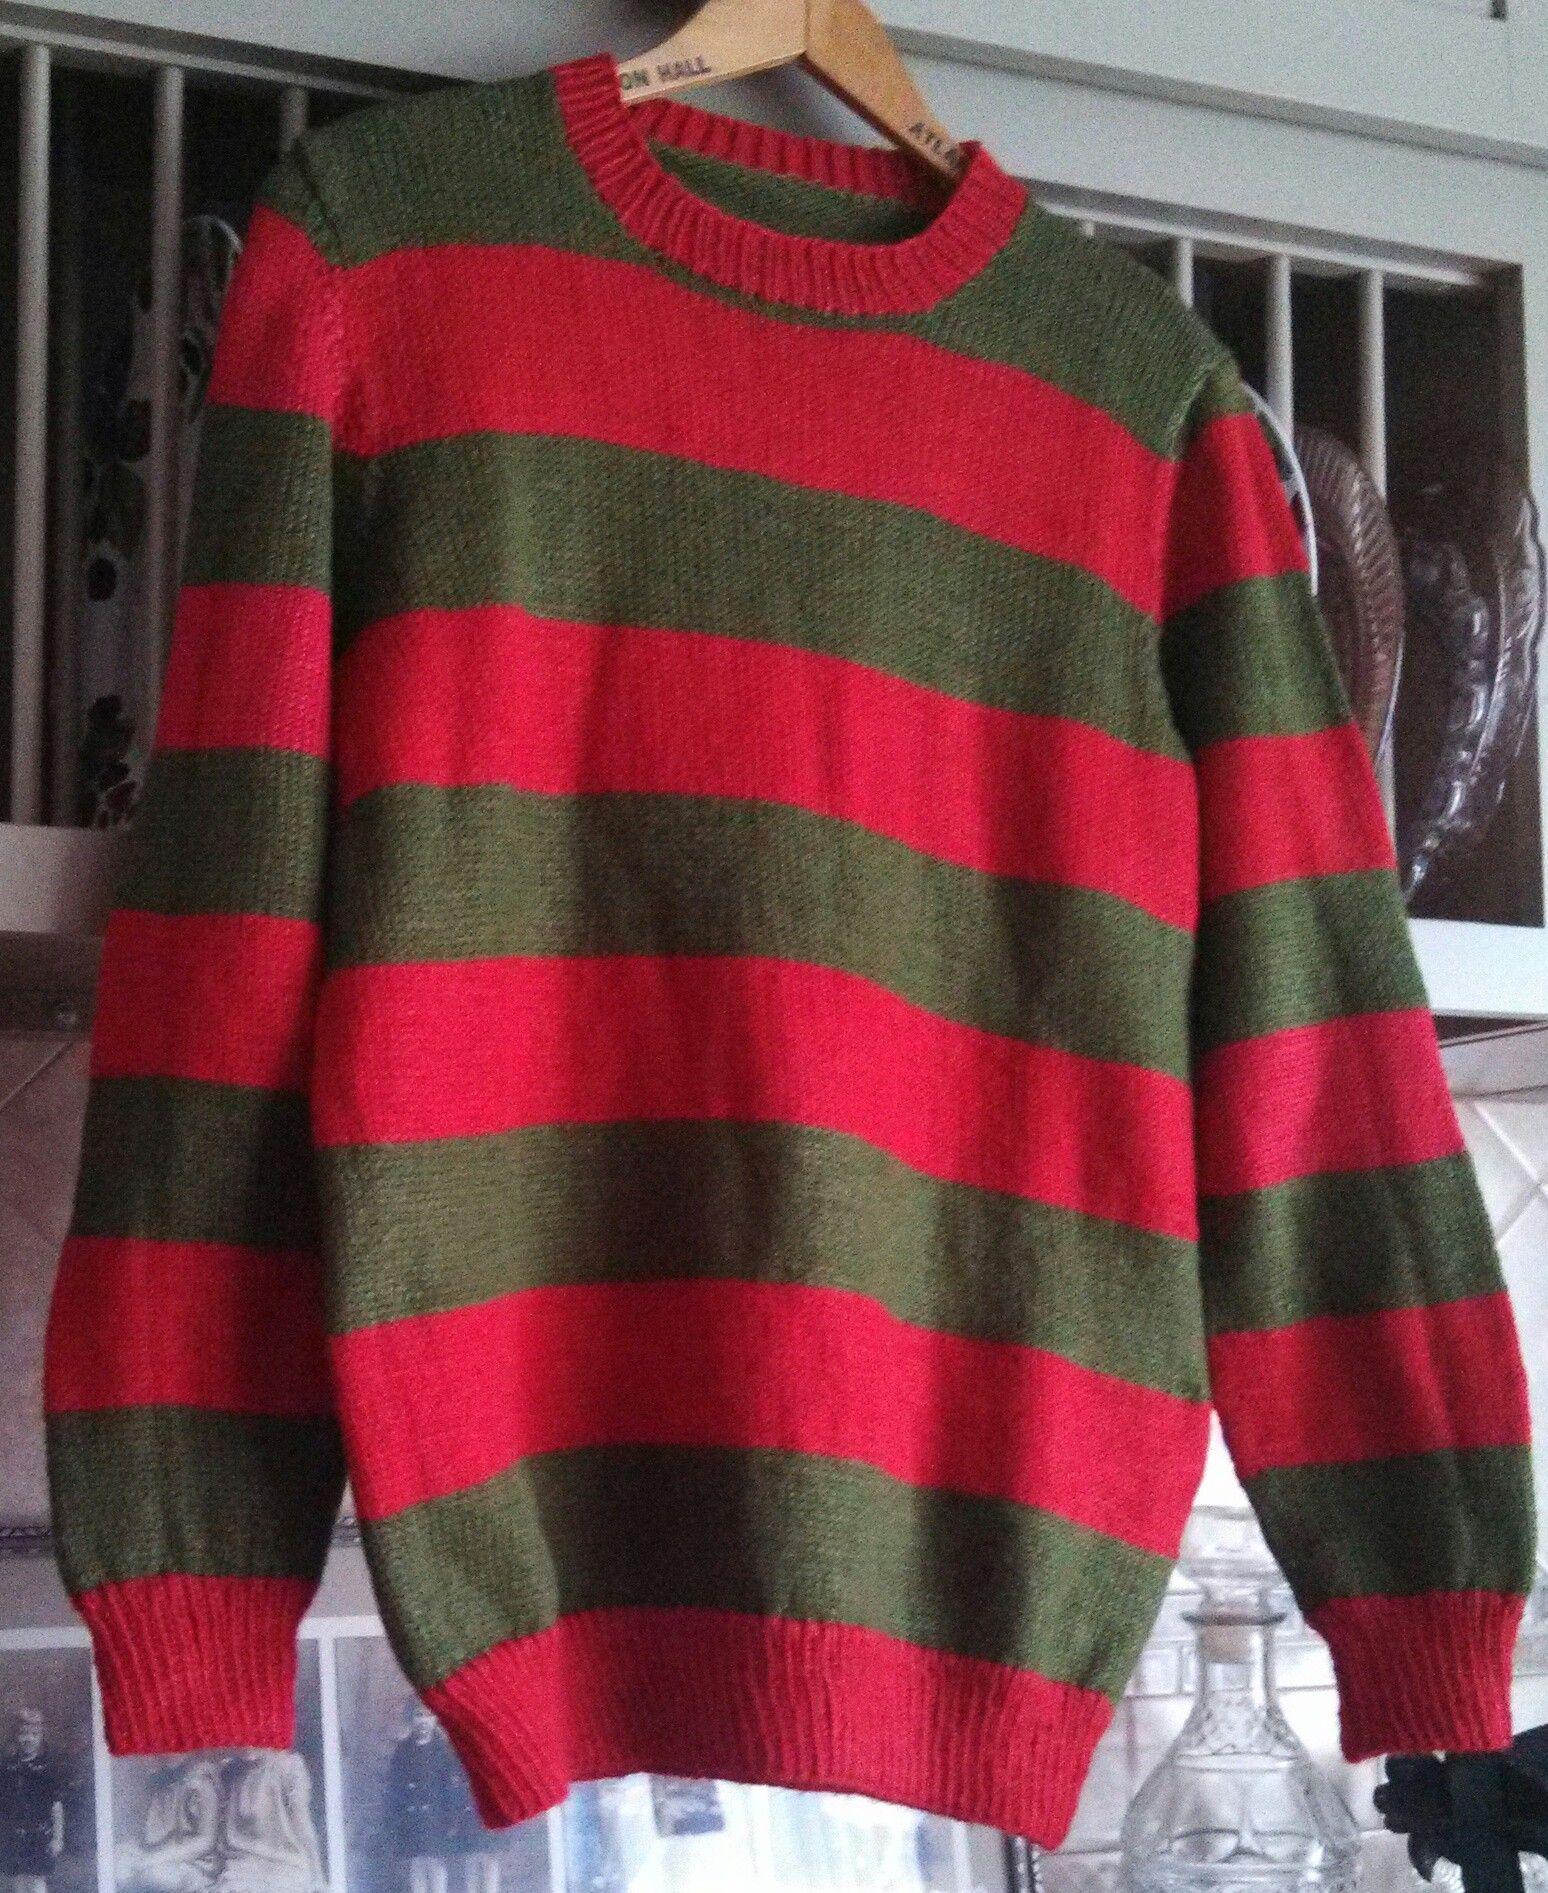 Freddy Krueger Sweater Granddaughter Holly